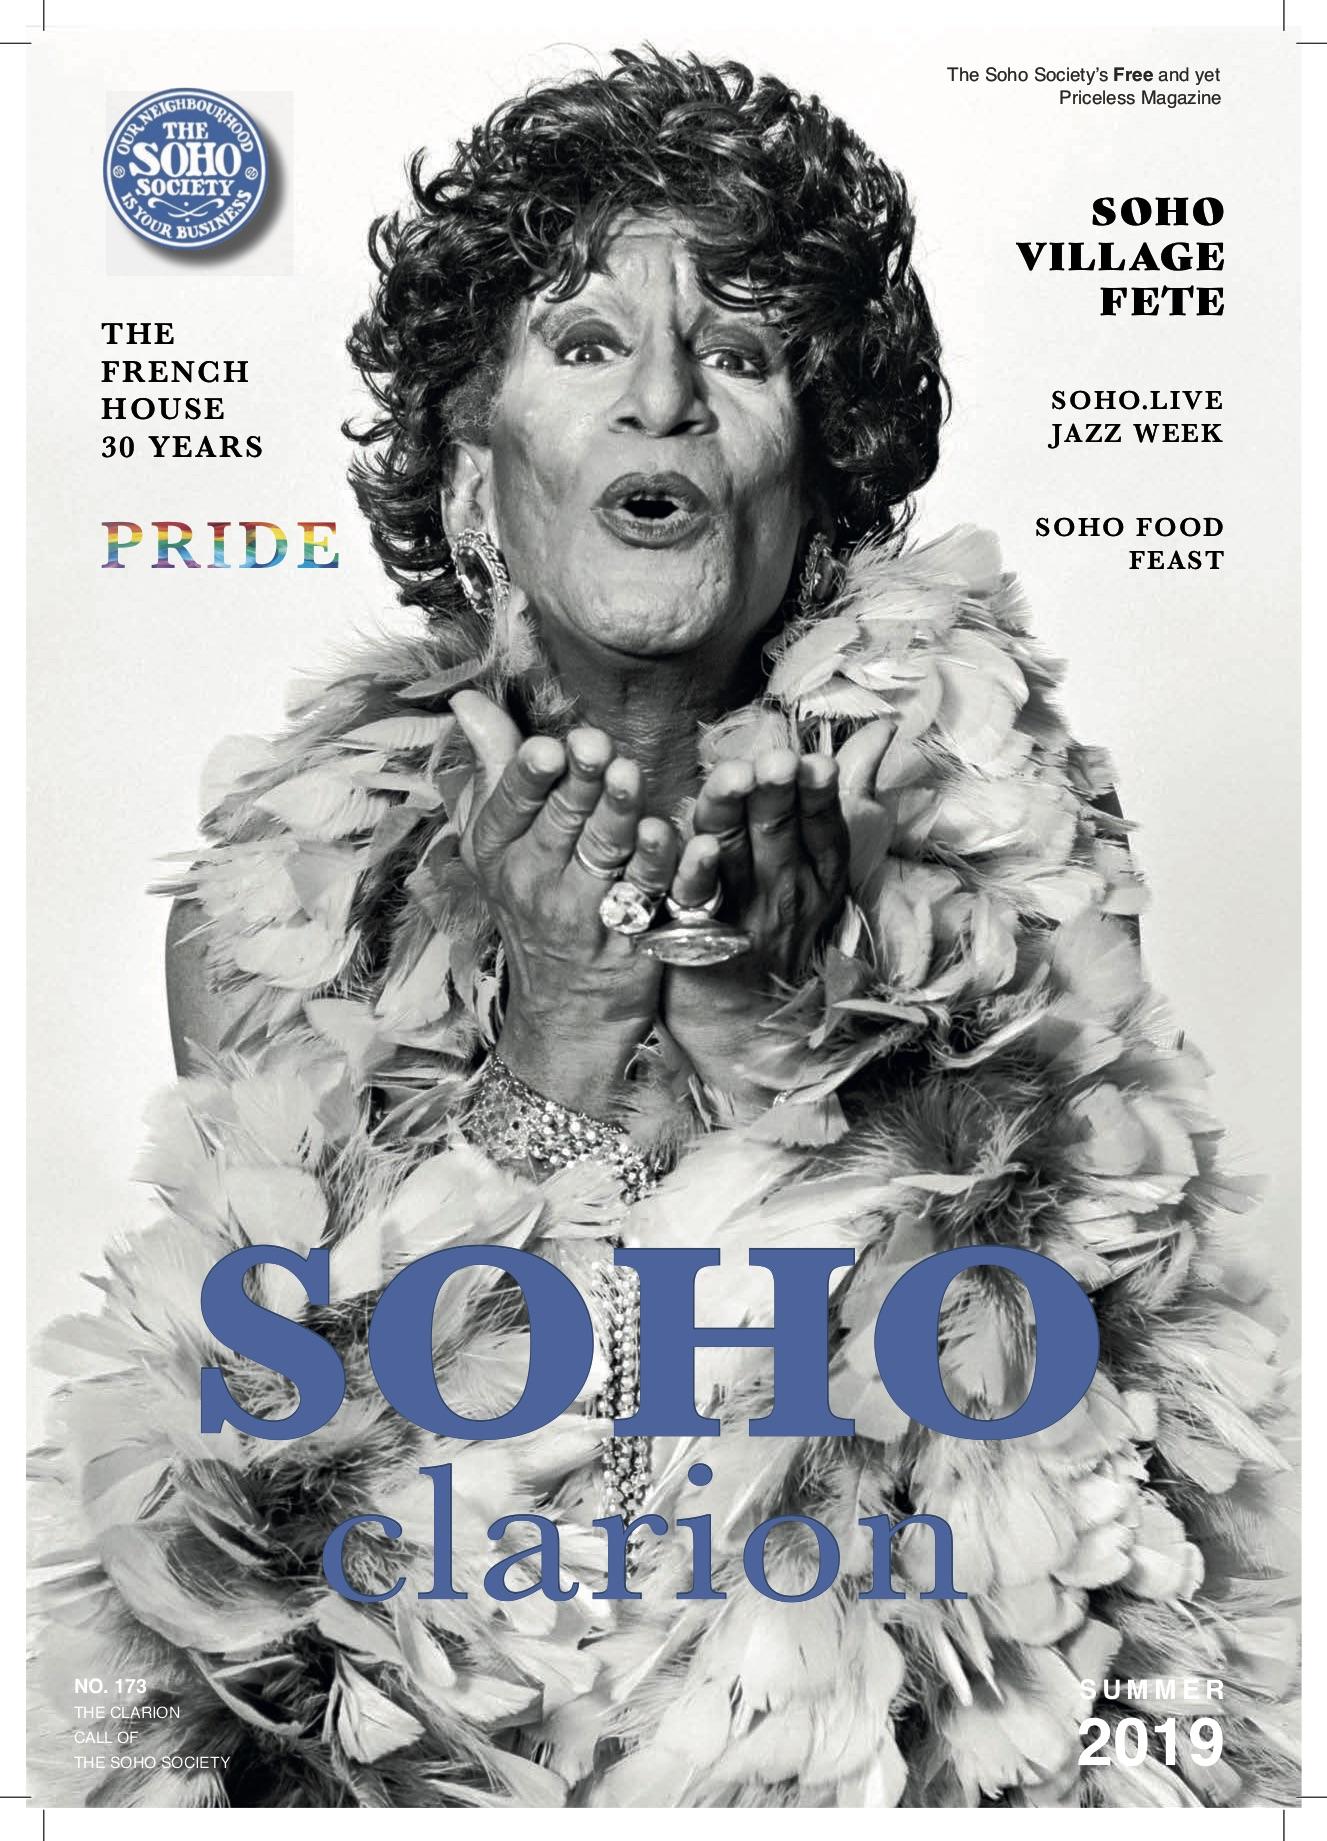 Summer 2019 - The Soho Summer Fete Edition